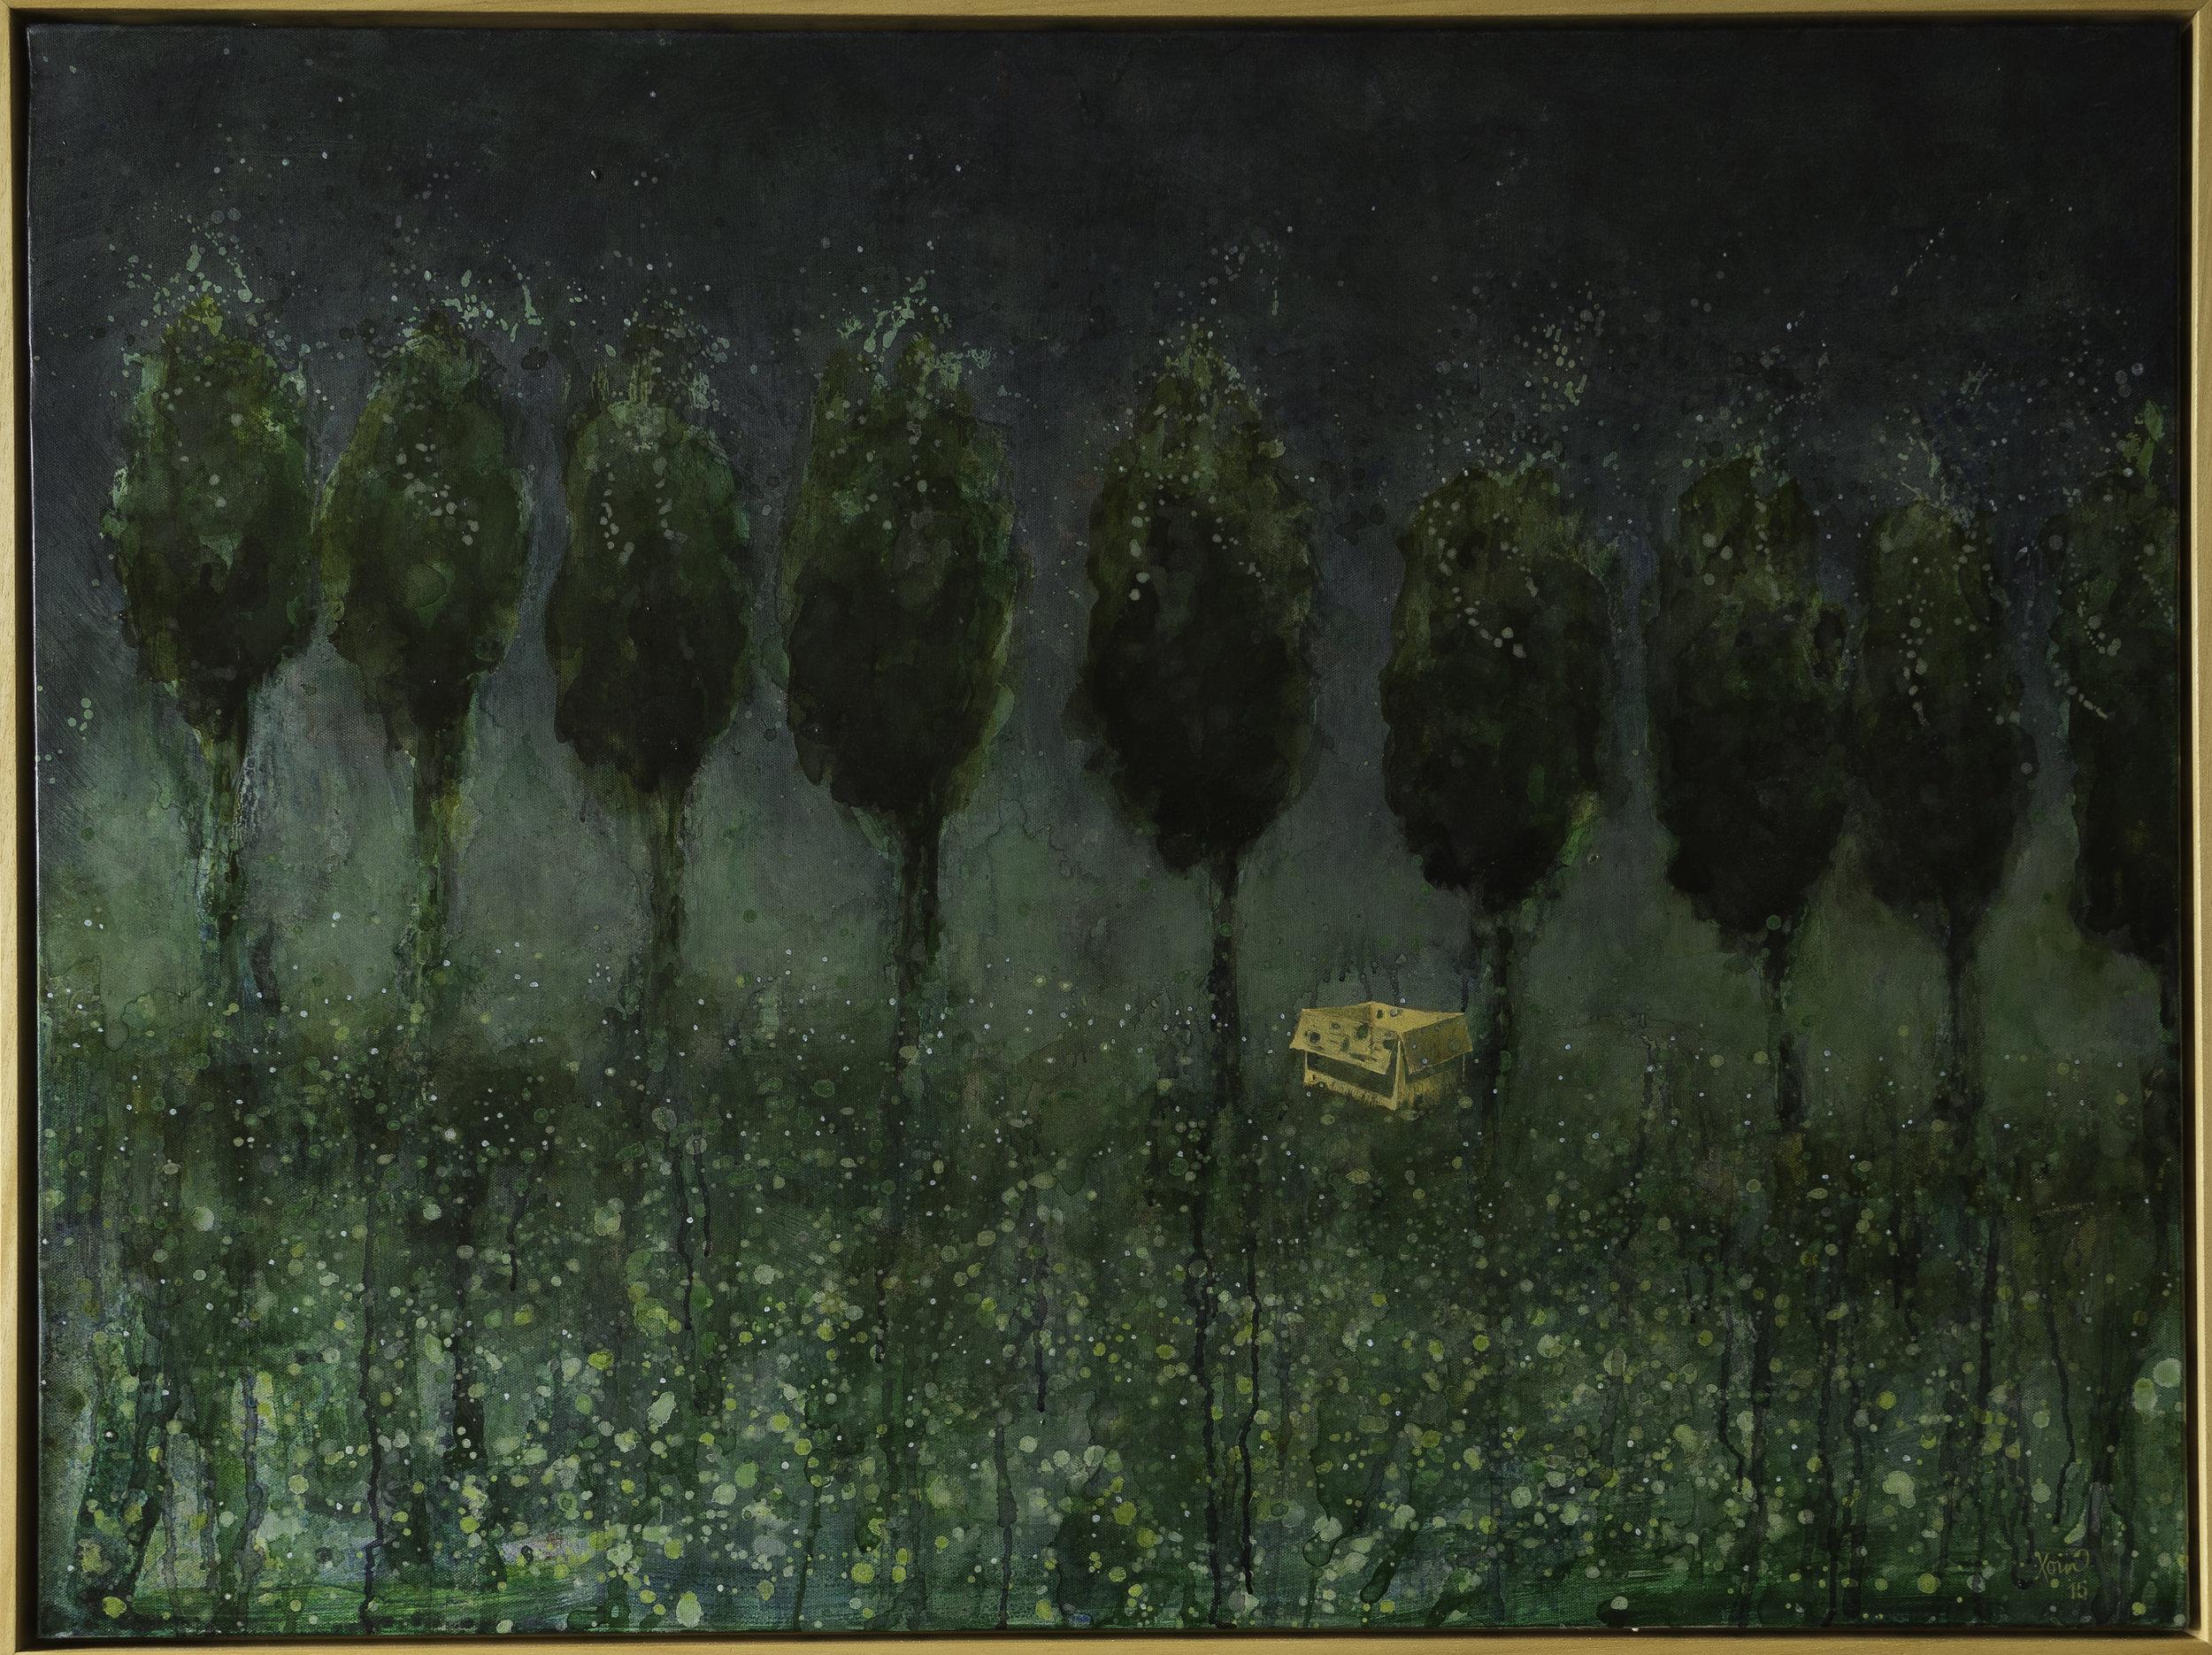 """Cardboard box in a forest"" 78.5x104.5cm (Framed). Acrylic on canvas 2015."